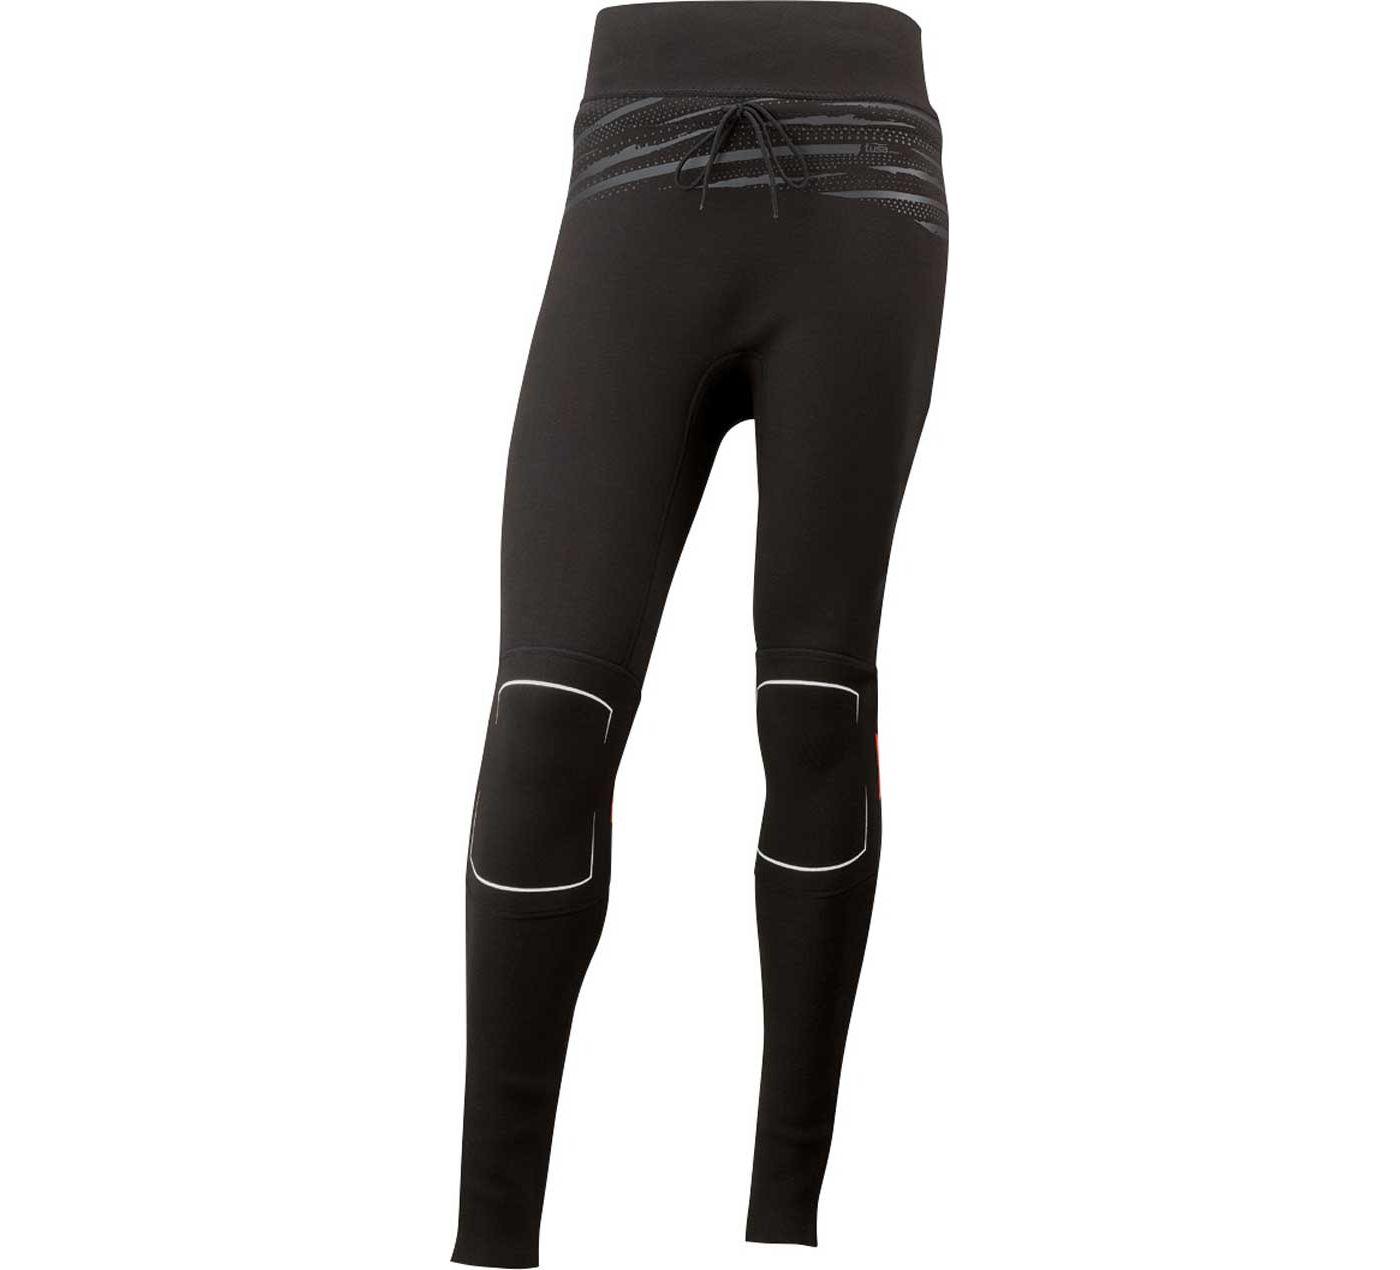 TUSA Sport Men's 2mm Neoprene Wetsuit Pants